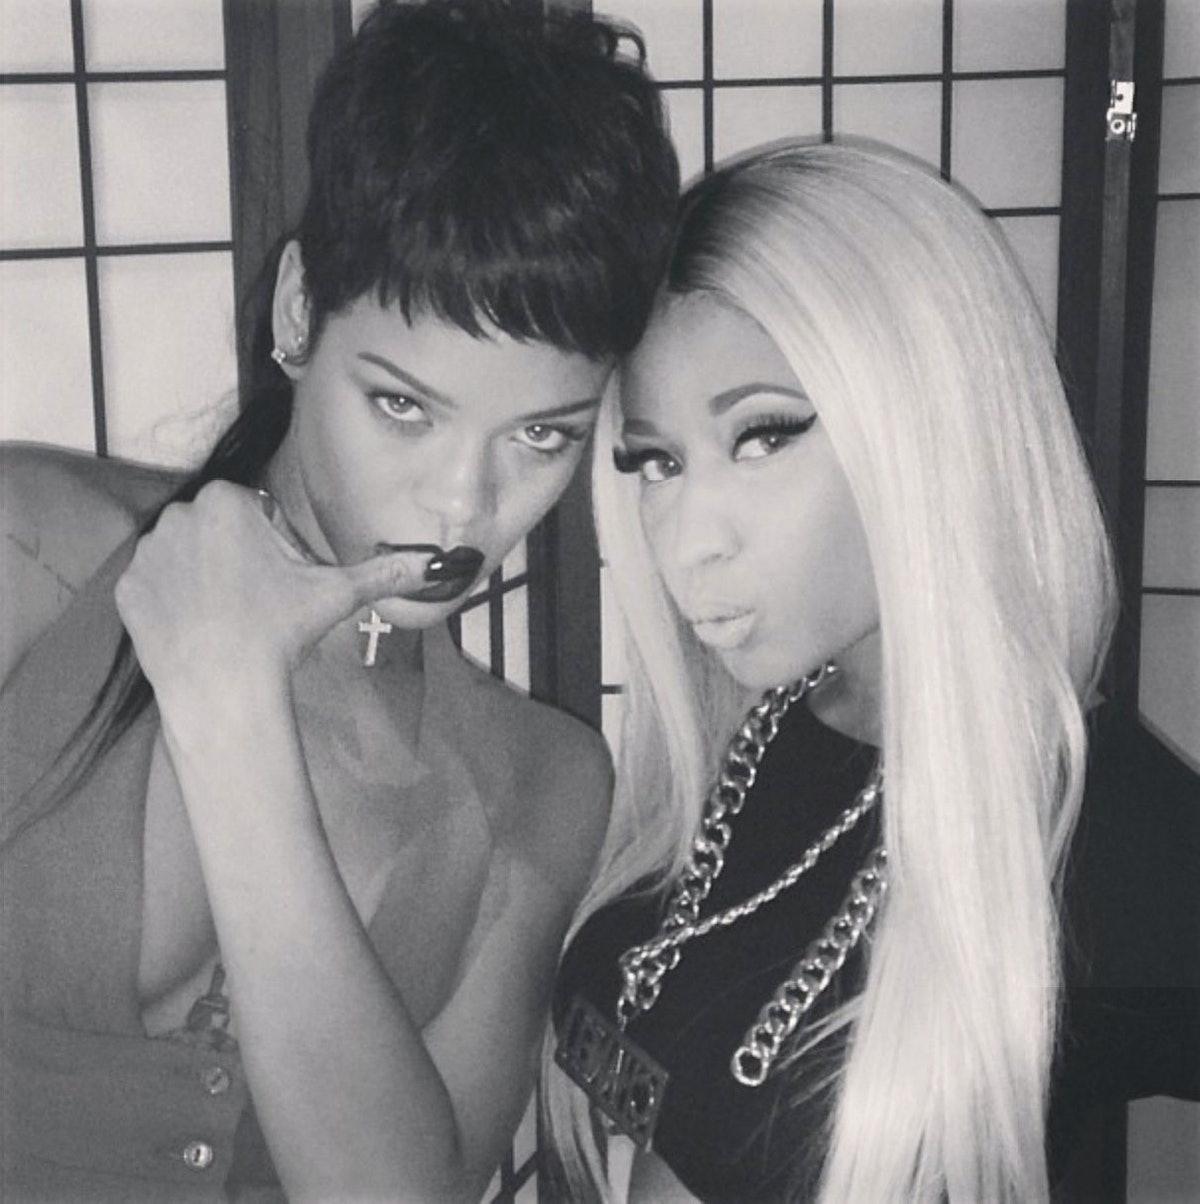 Rihanna and Nicki Minaj.